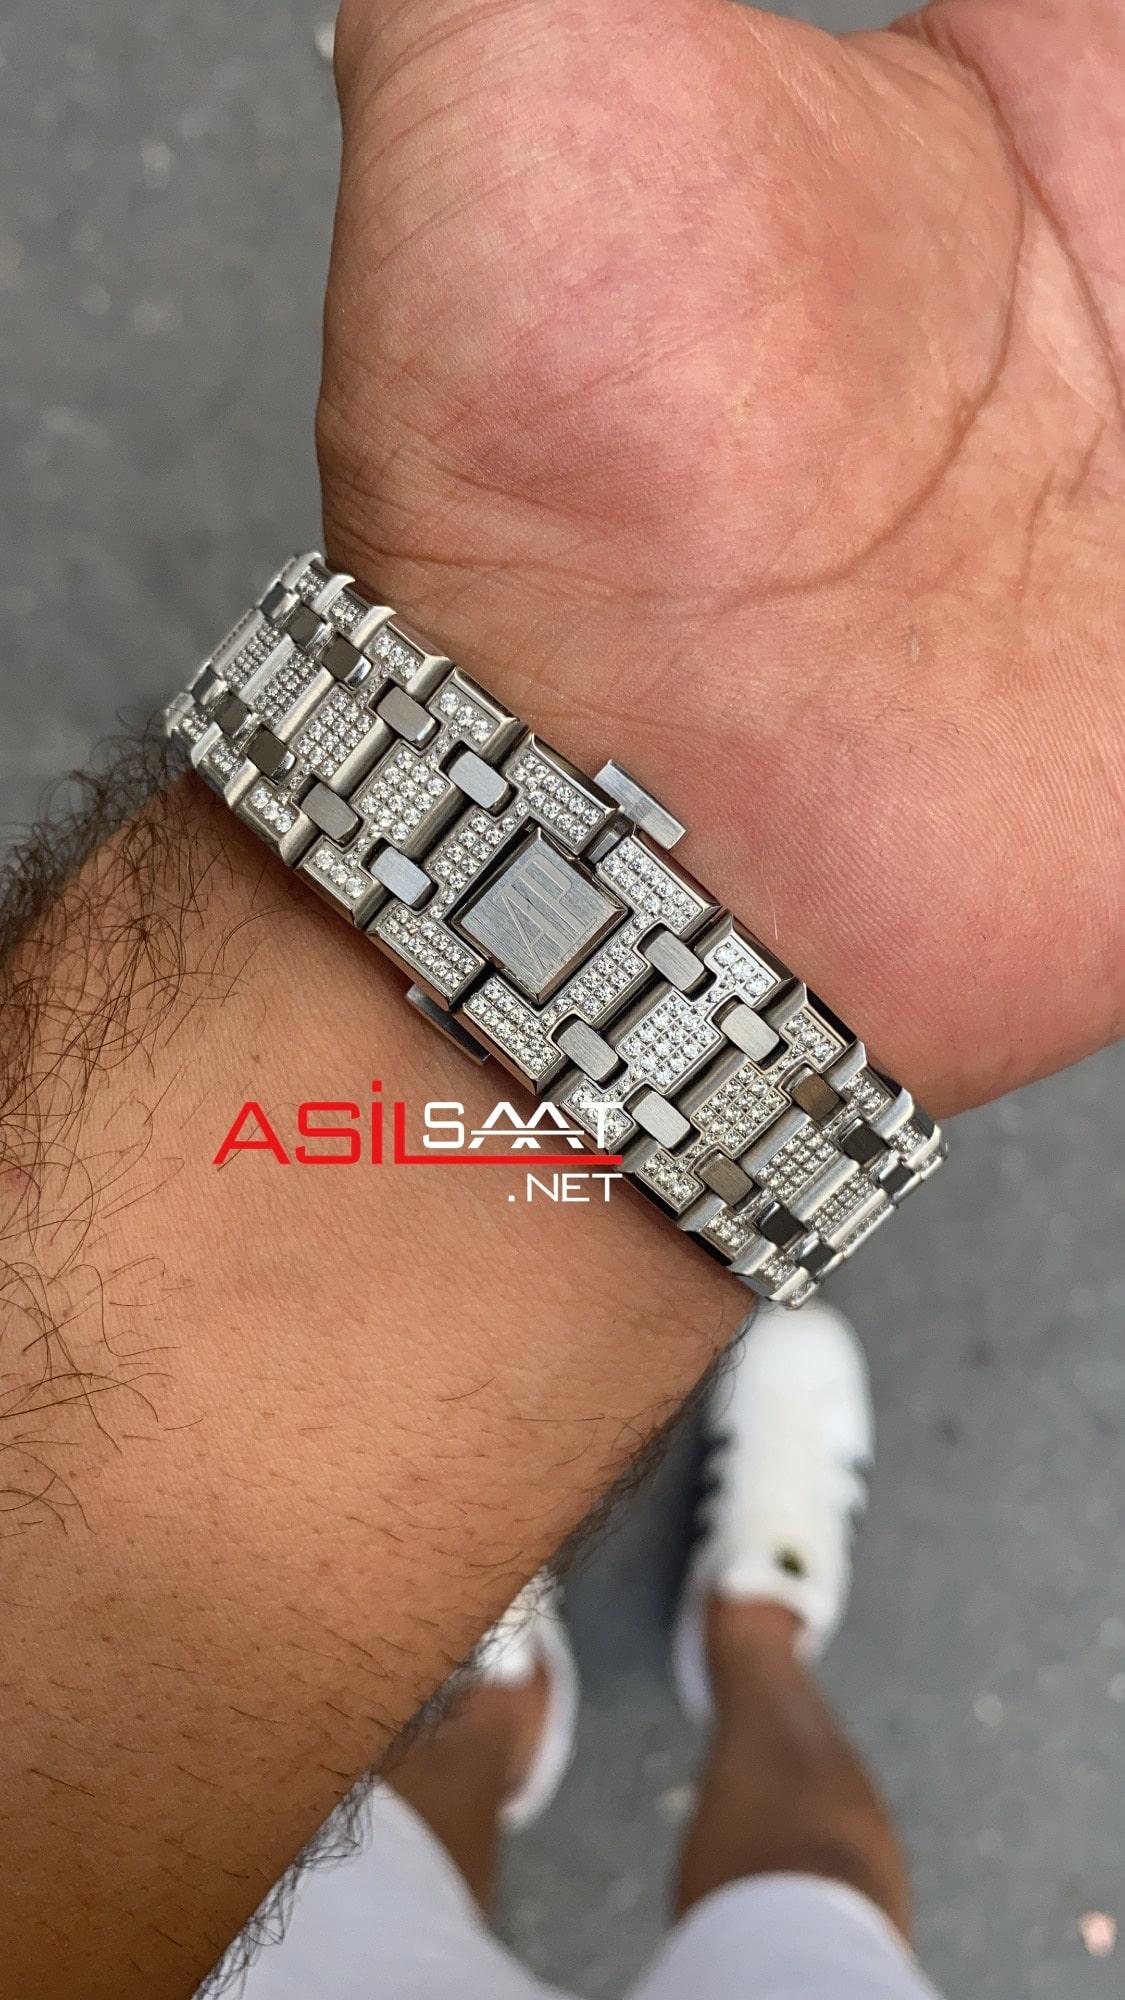 Audemars Piguet Royal Oak Diamond APRD007